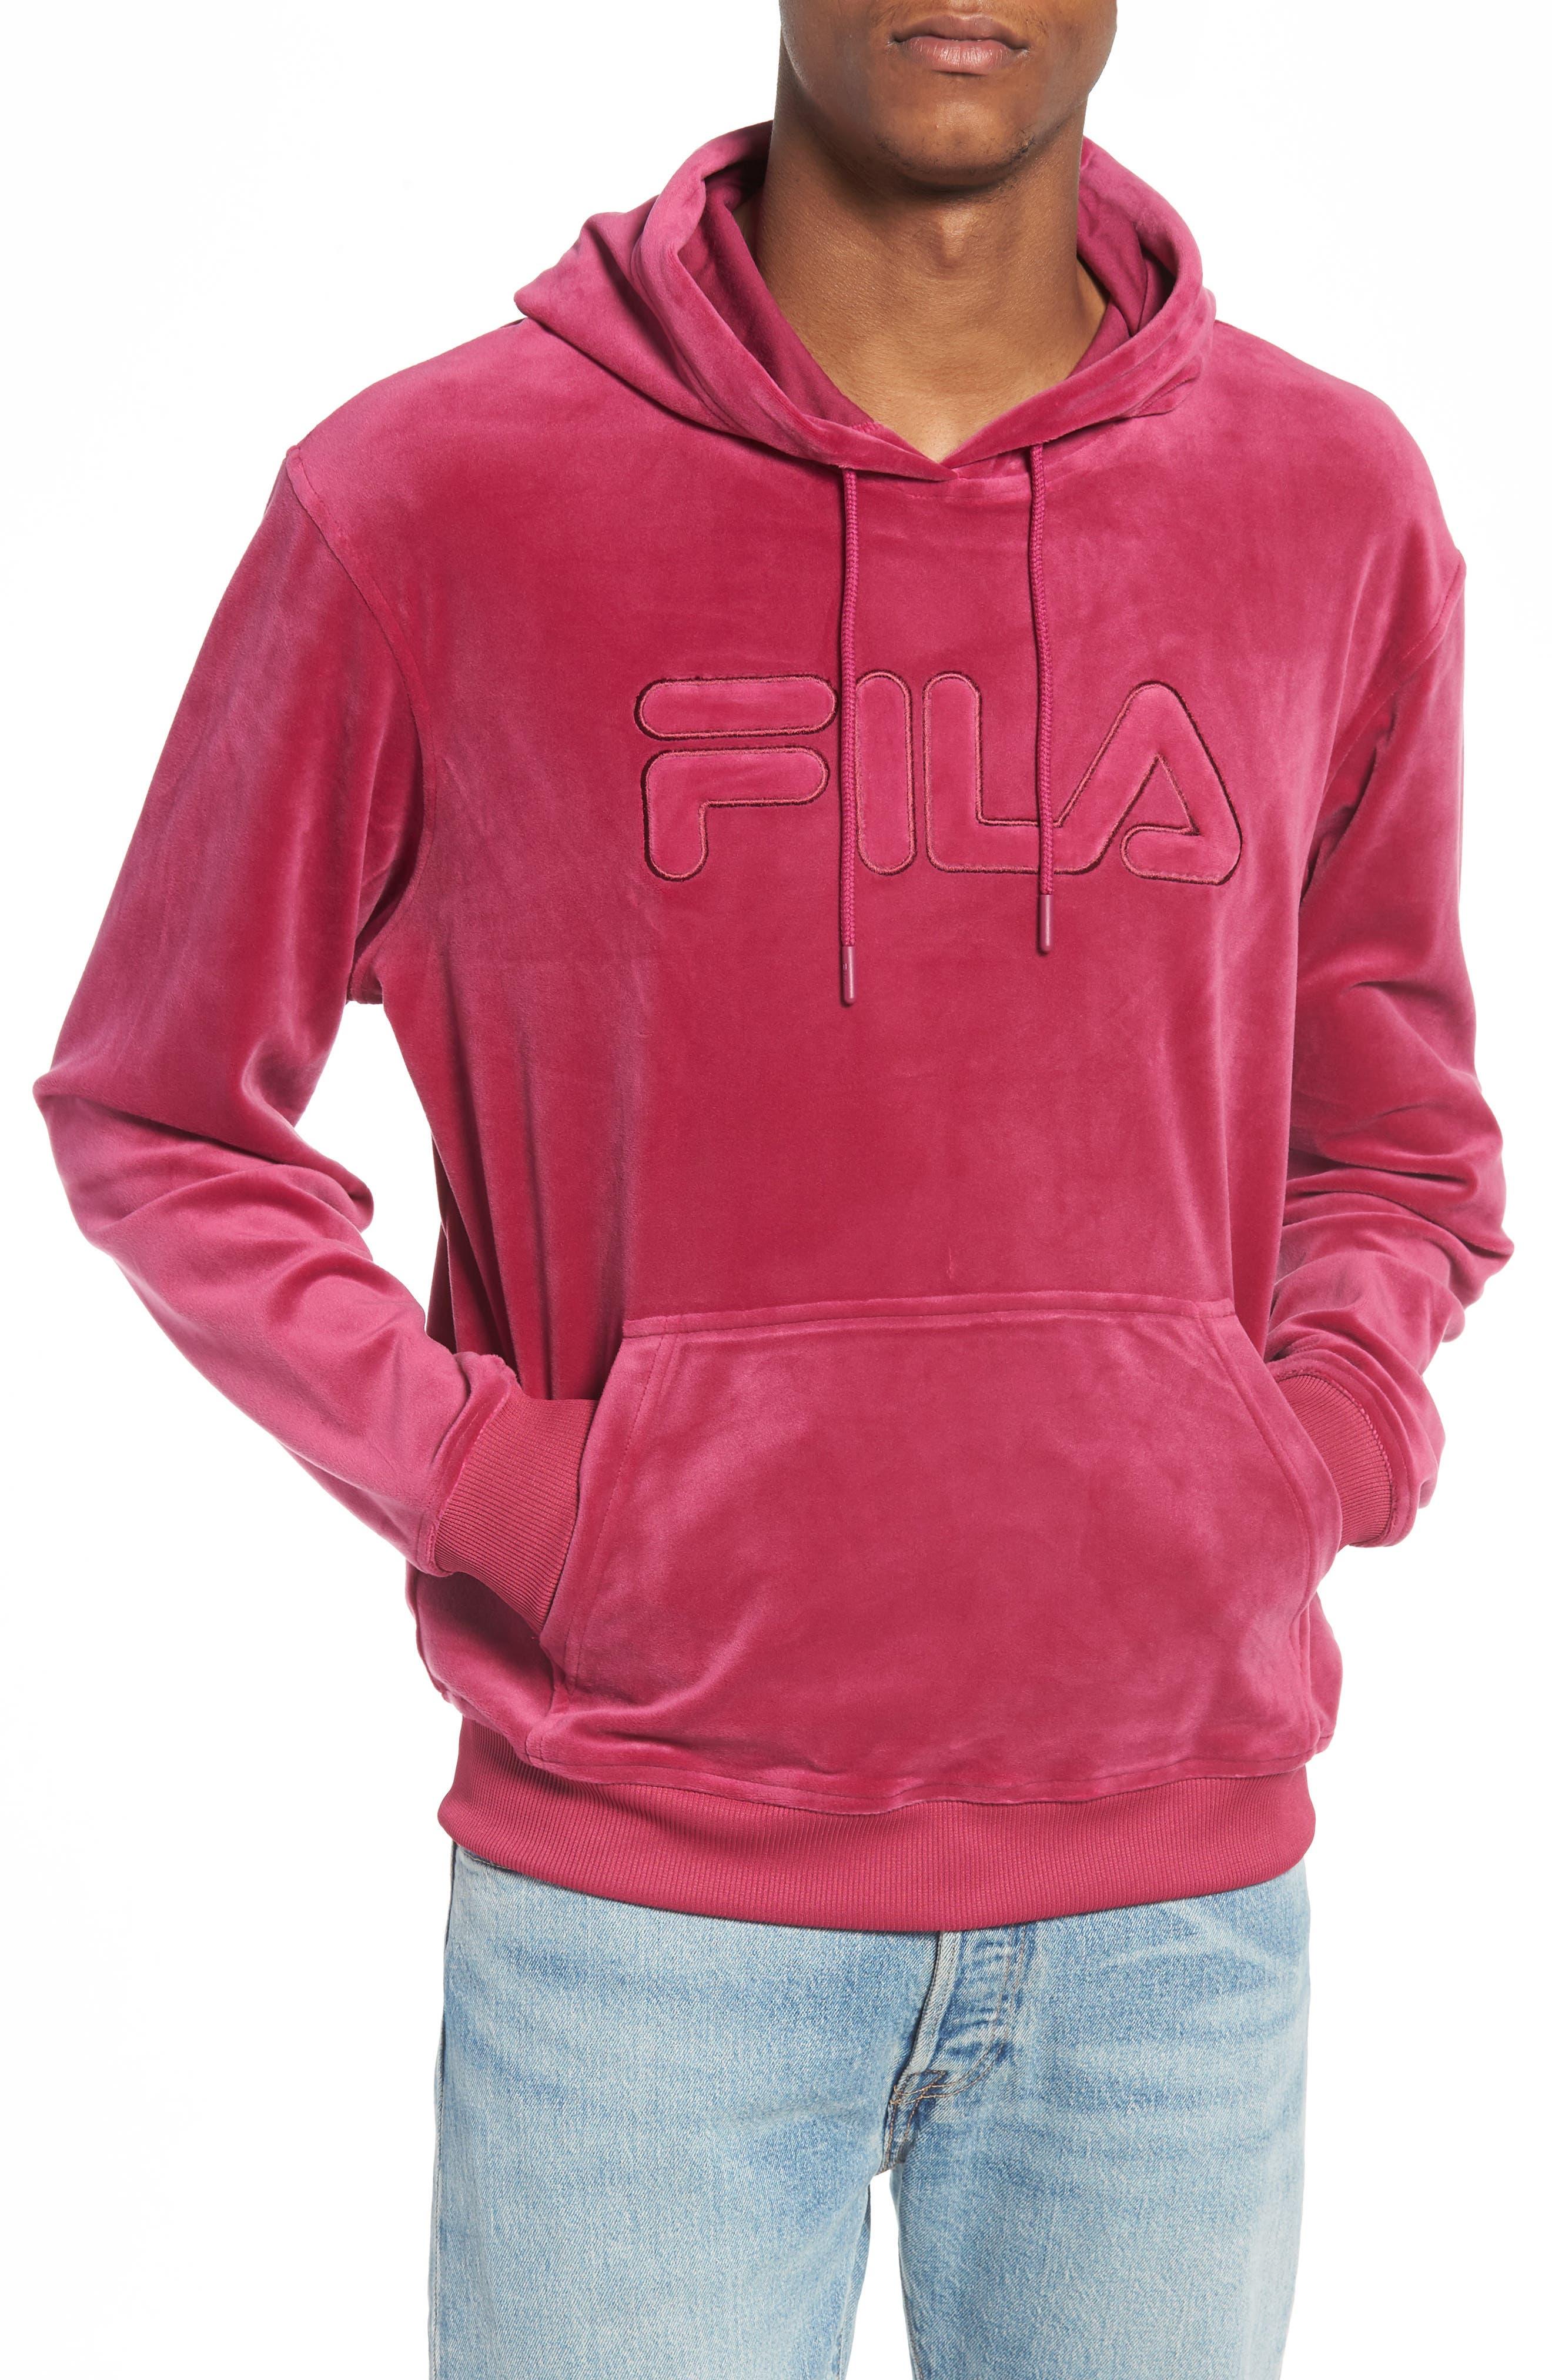 Asher Velour Hoodie Sweatshirt,                             Main thumbnail 1, color,                             Rasberry Radiance